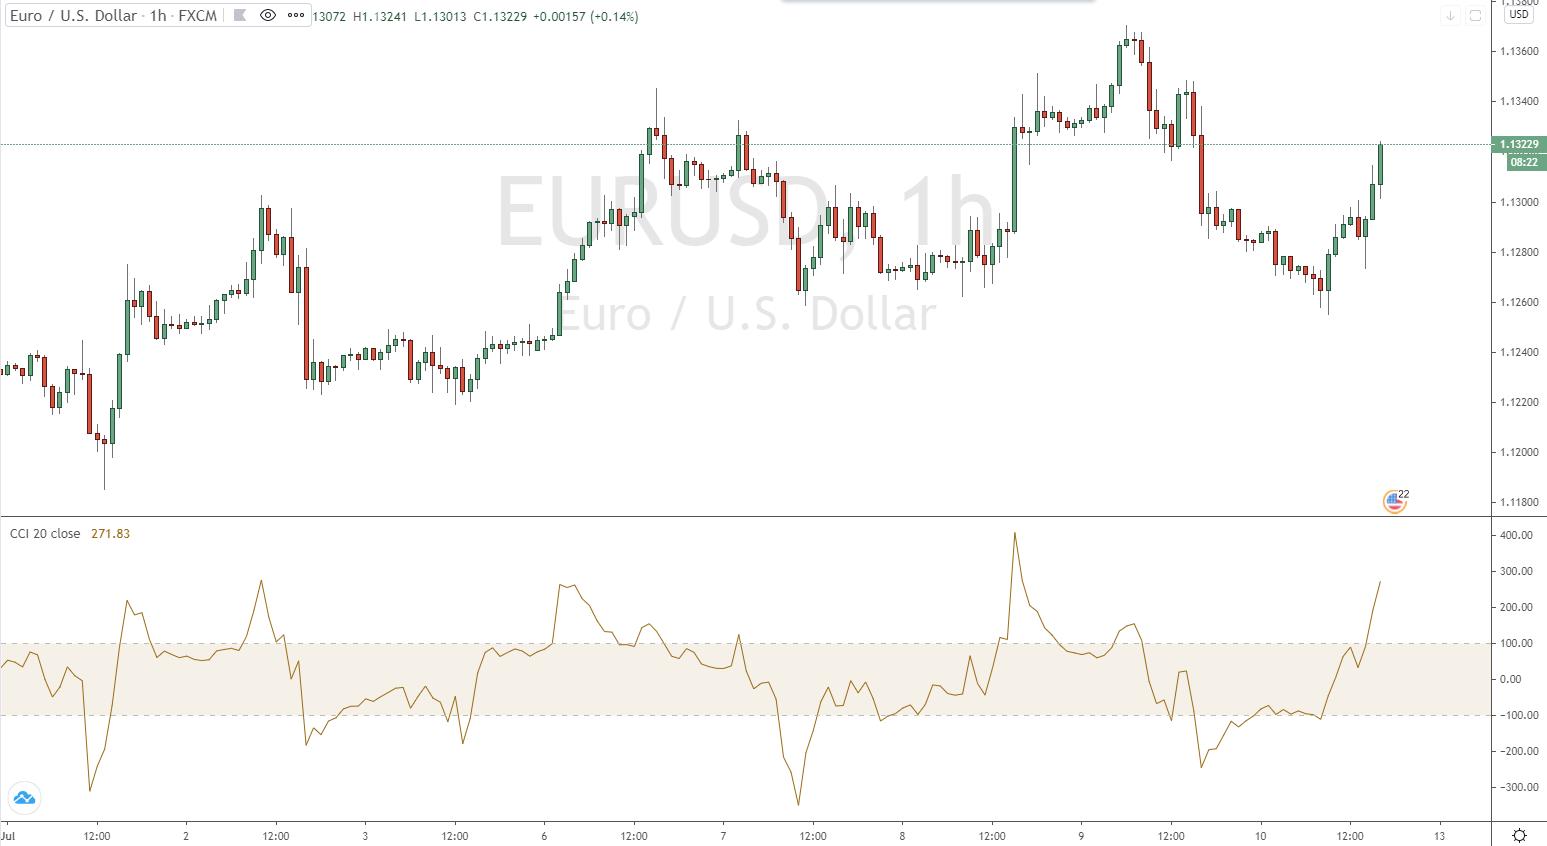 CCI im EURUSD Stundenchart